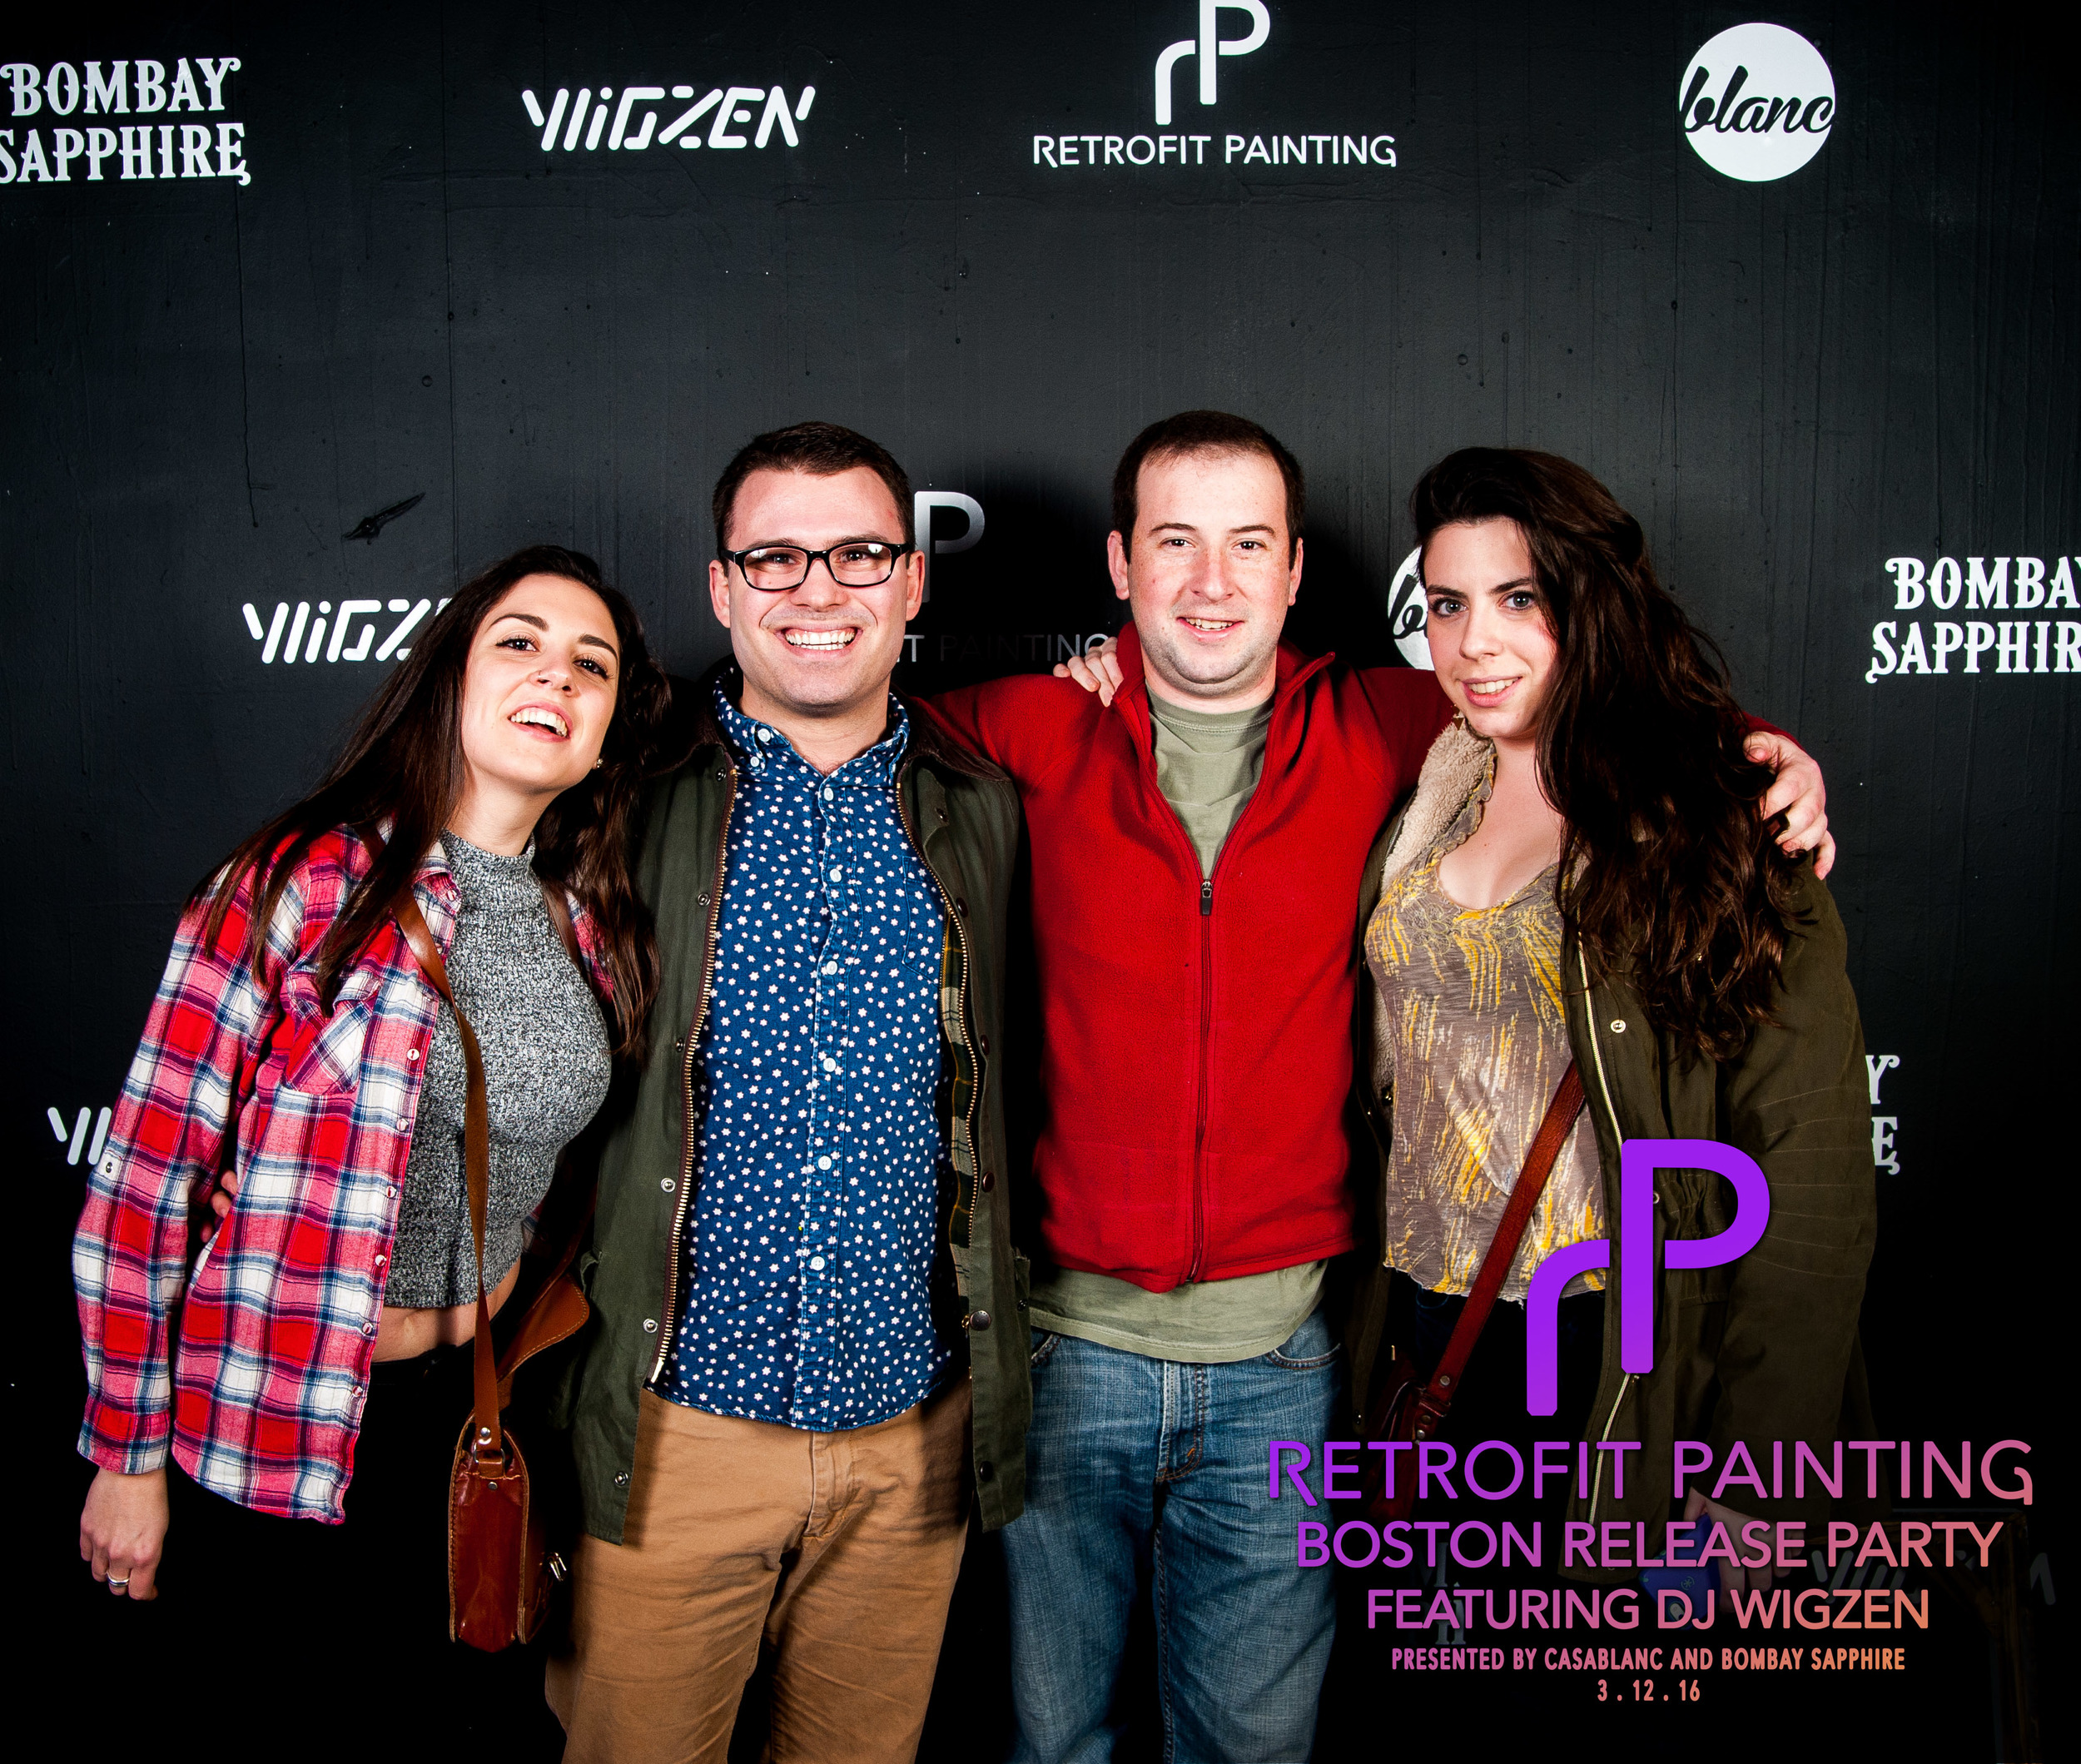 Retrofit Painting Boston Release Party 026.jpg